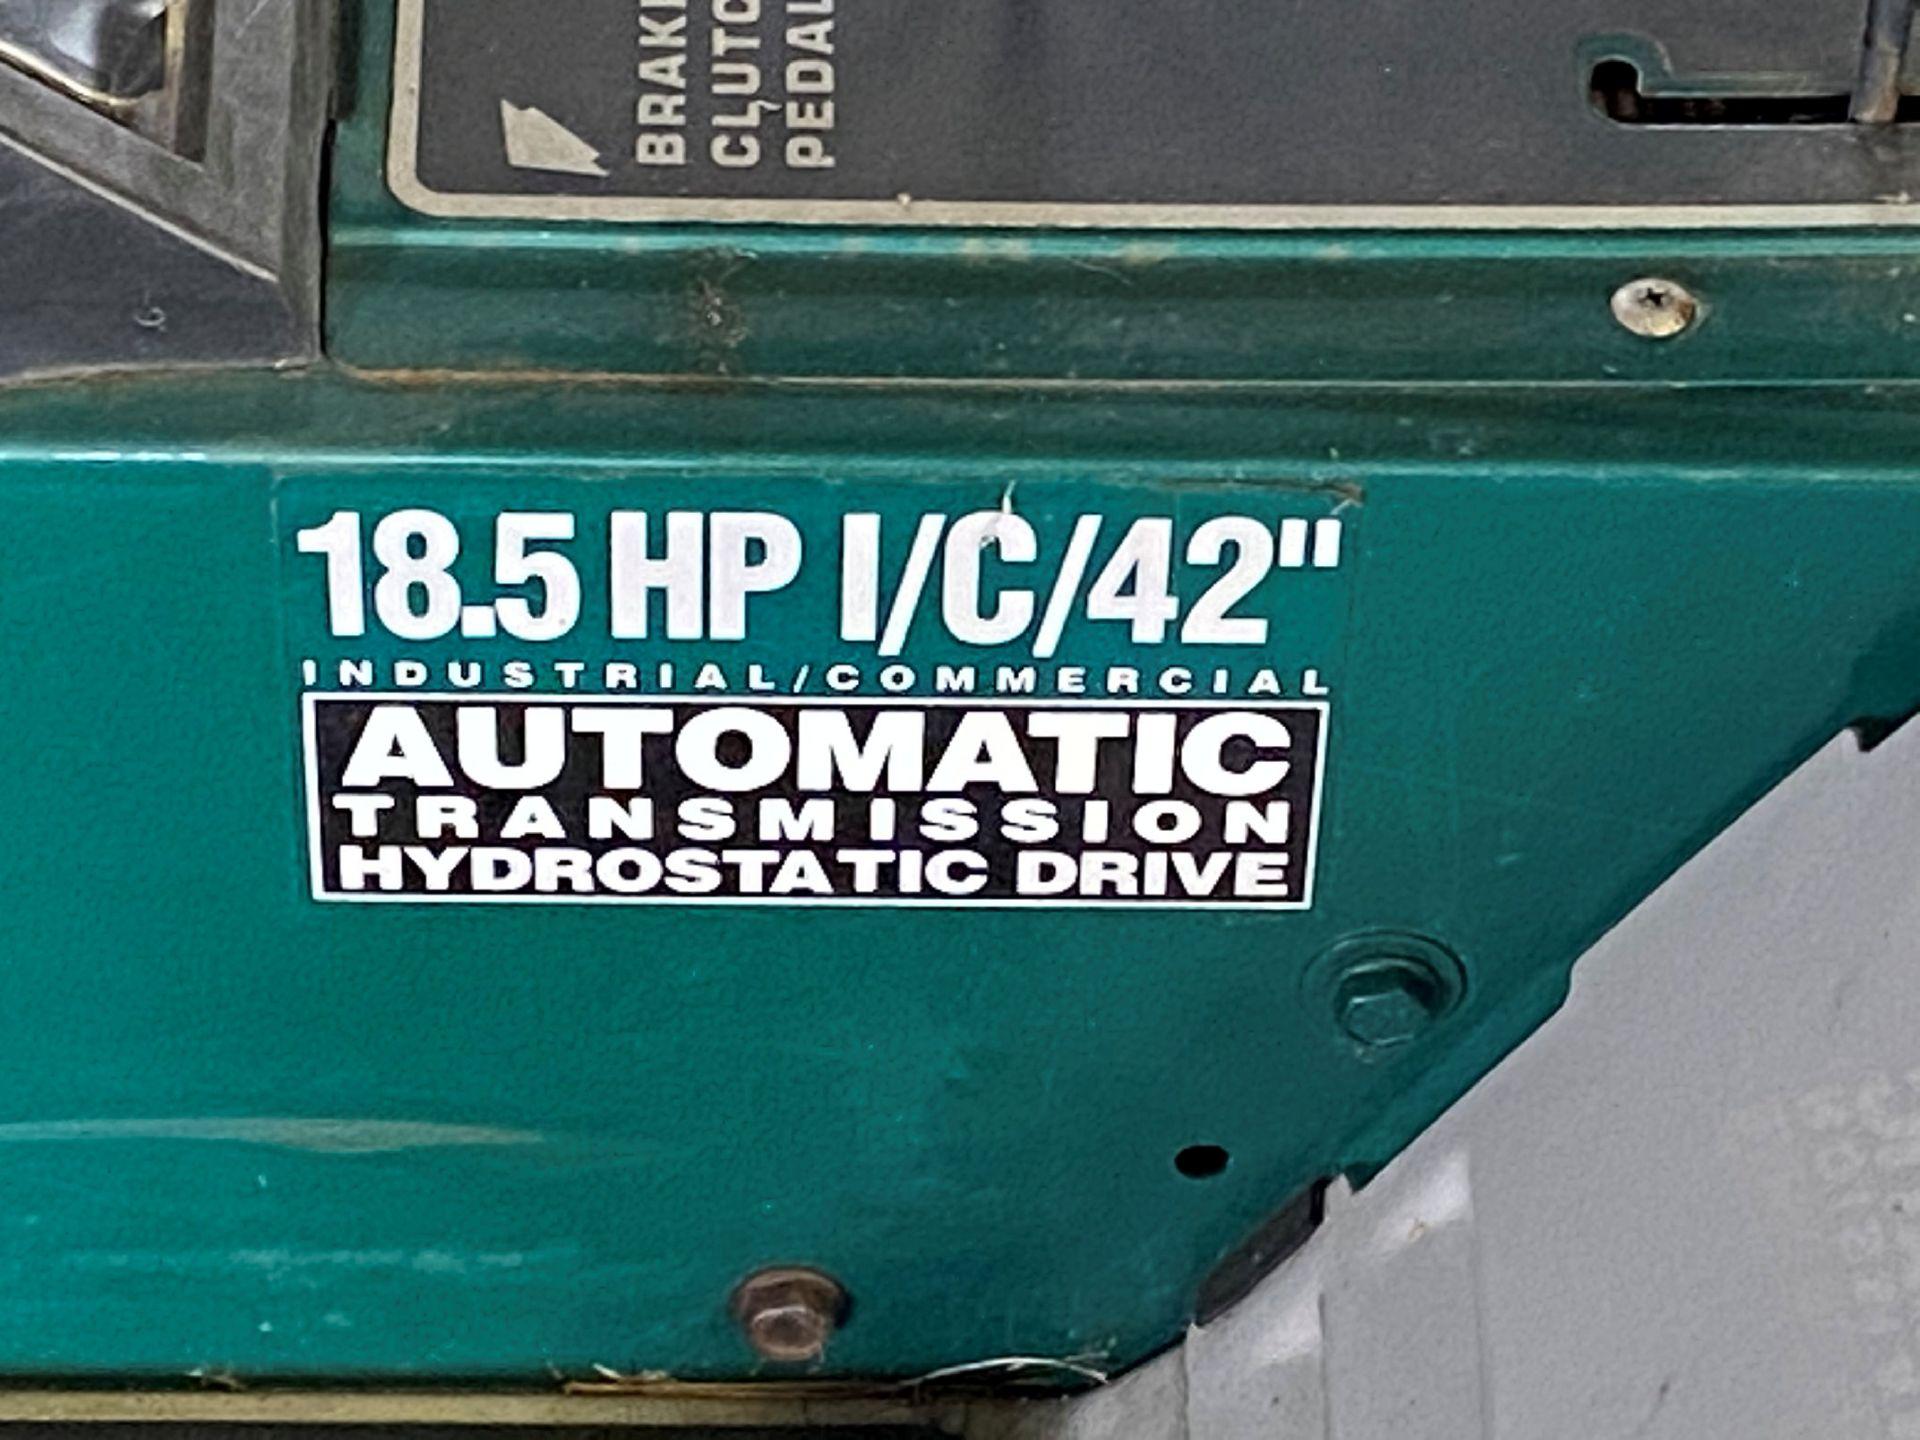 "MTD Yard Machine 18.5-HP x 42"" Cut, Gas Powered Riding Lawn Mower - Image 3 of 3"